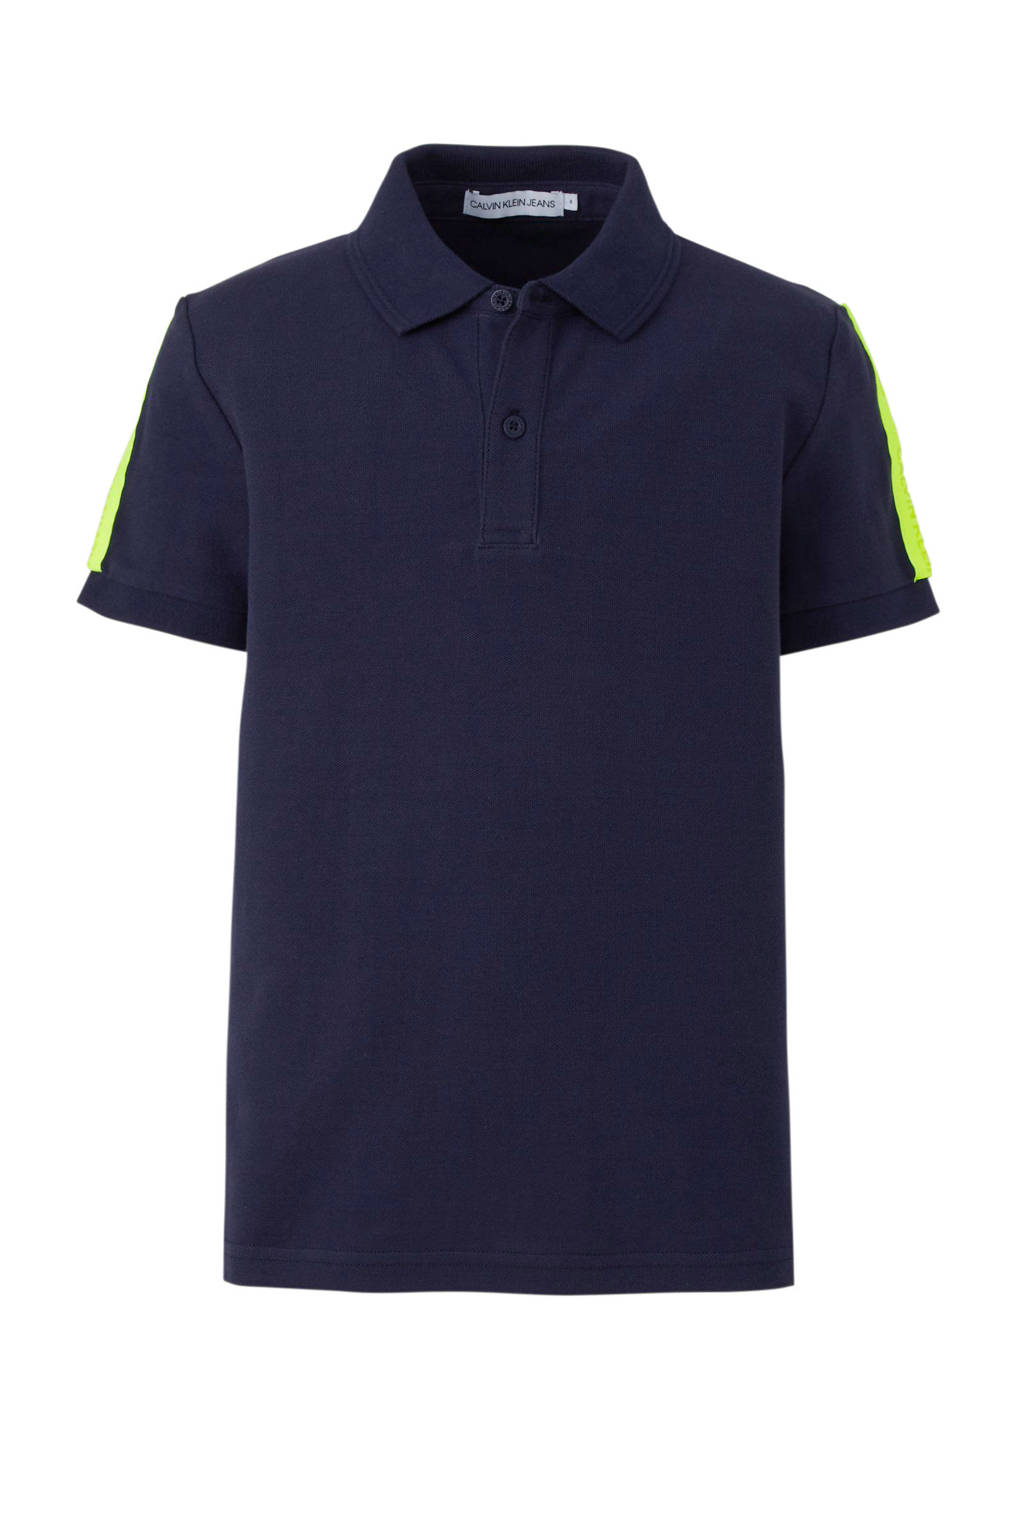 CALVIN KLEIN JEANS polo met contrastbies donkerblauw, Donkerblauw/geel